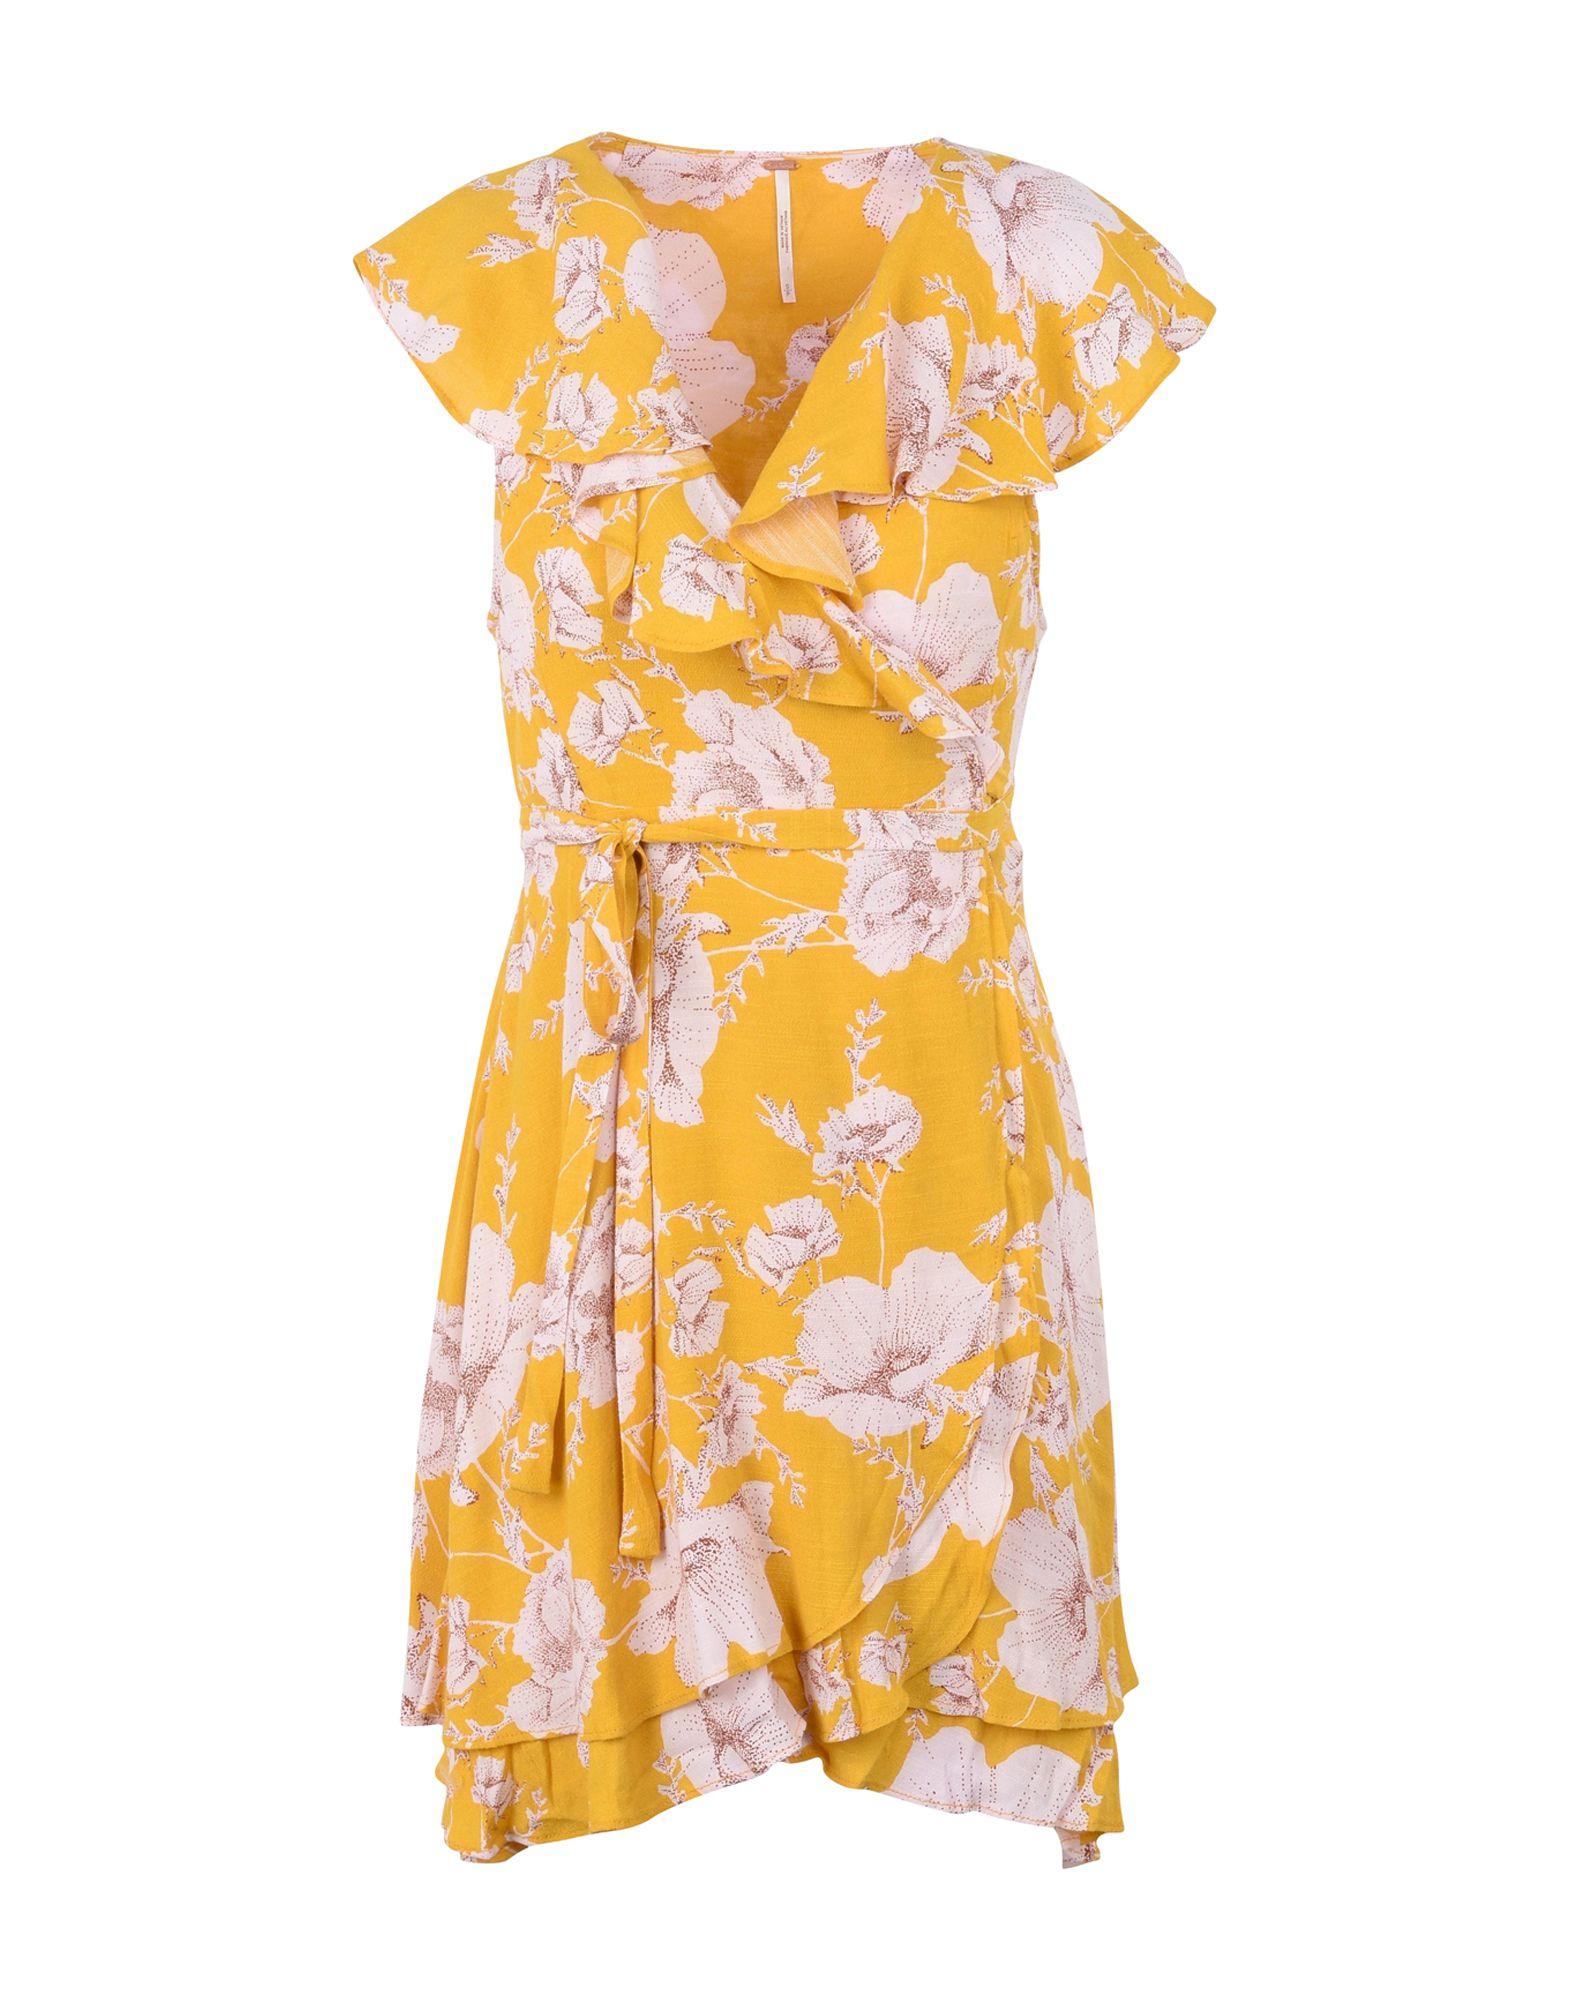 FREE PEOPLE Damen Kurzes Kleid Farbe Gelb Größe 5